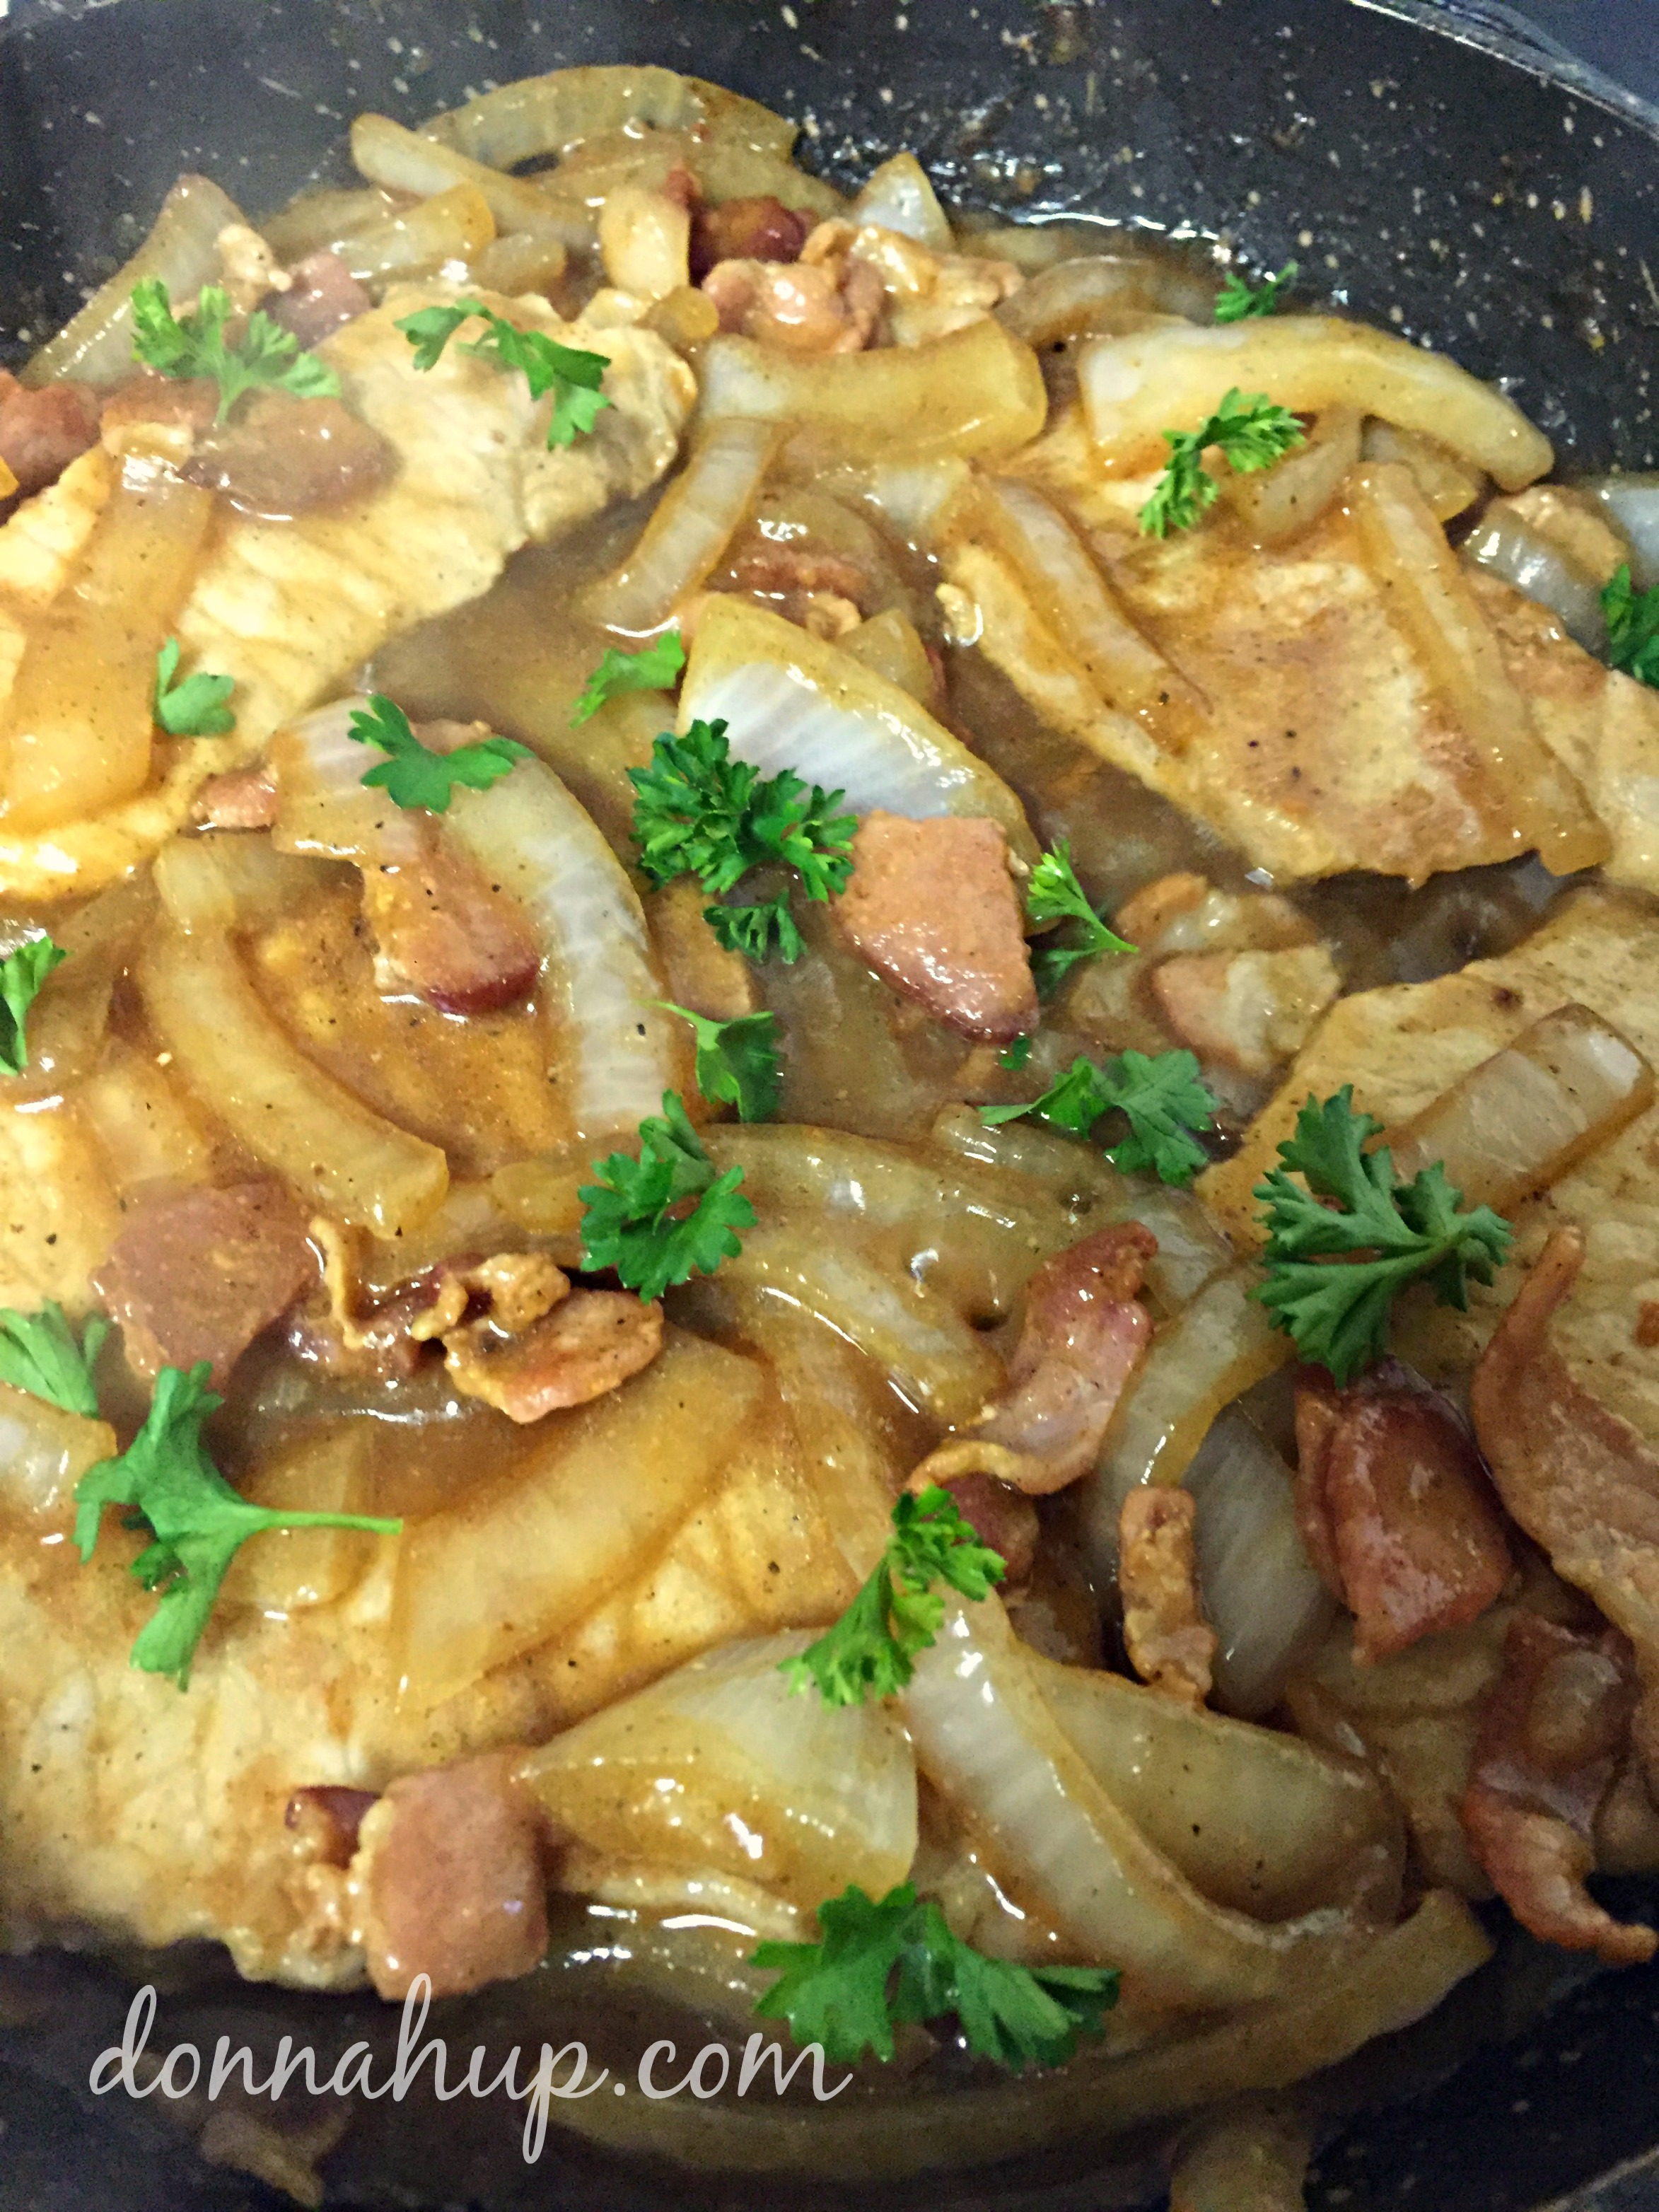 30 Minute French Onion Pork One Pot Meals #AllNaturalPork #recipe #ad